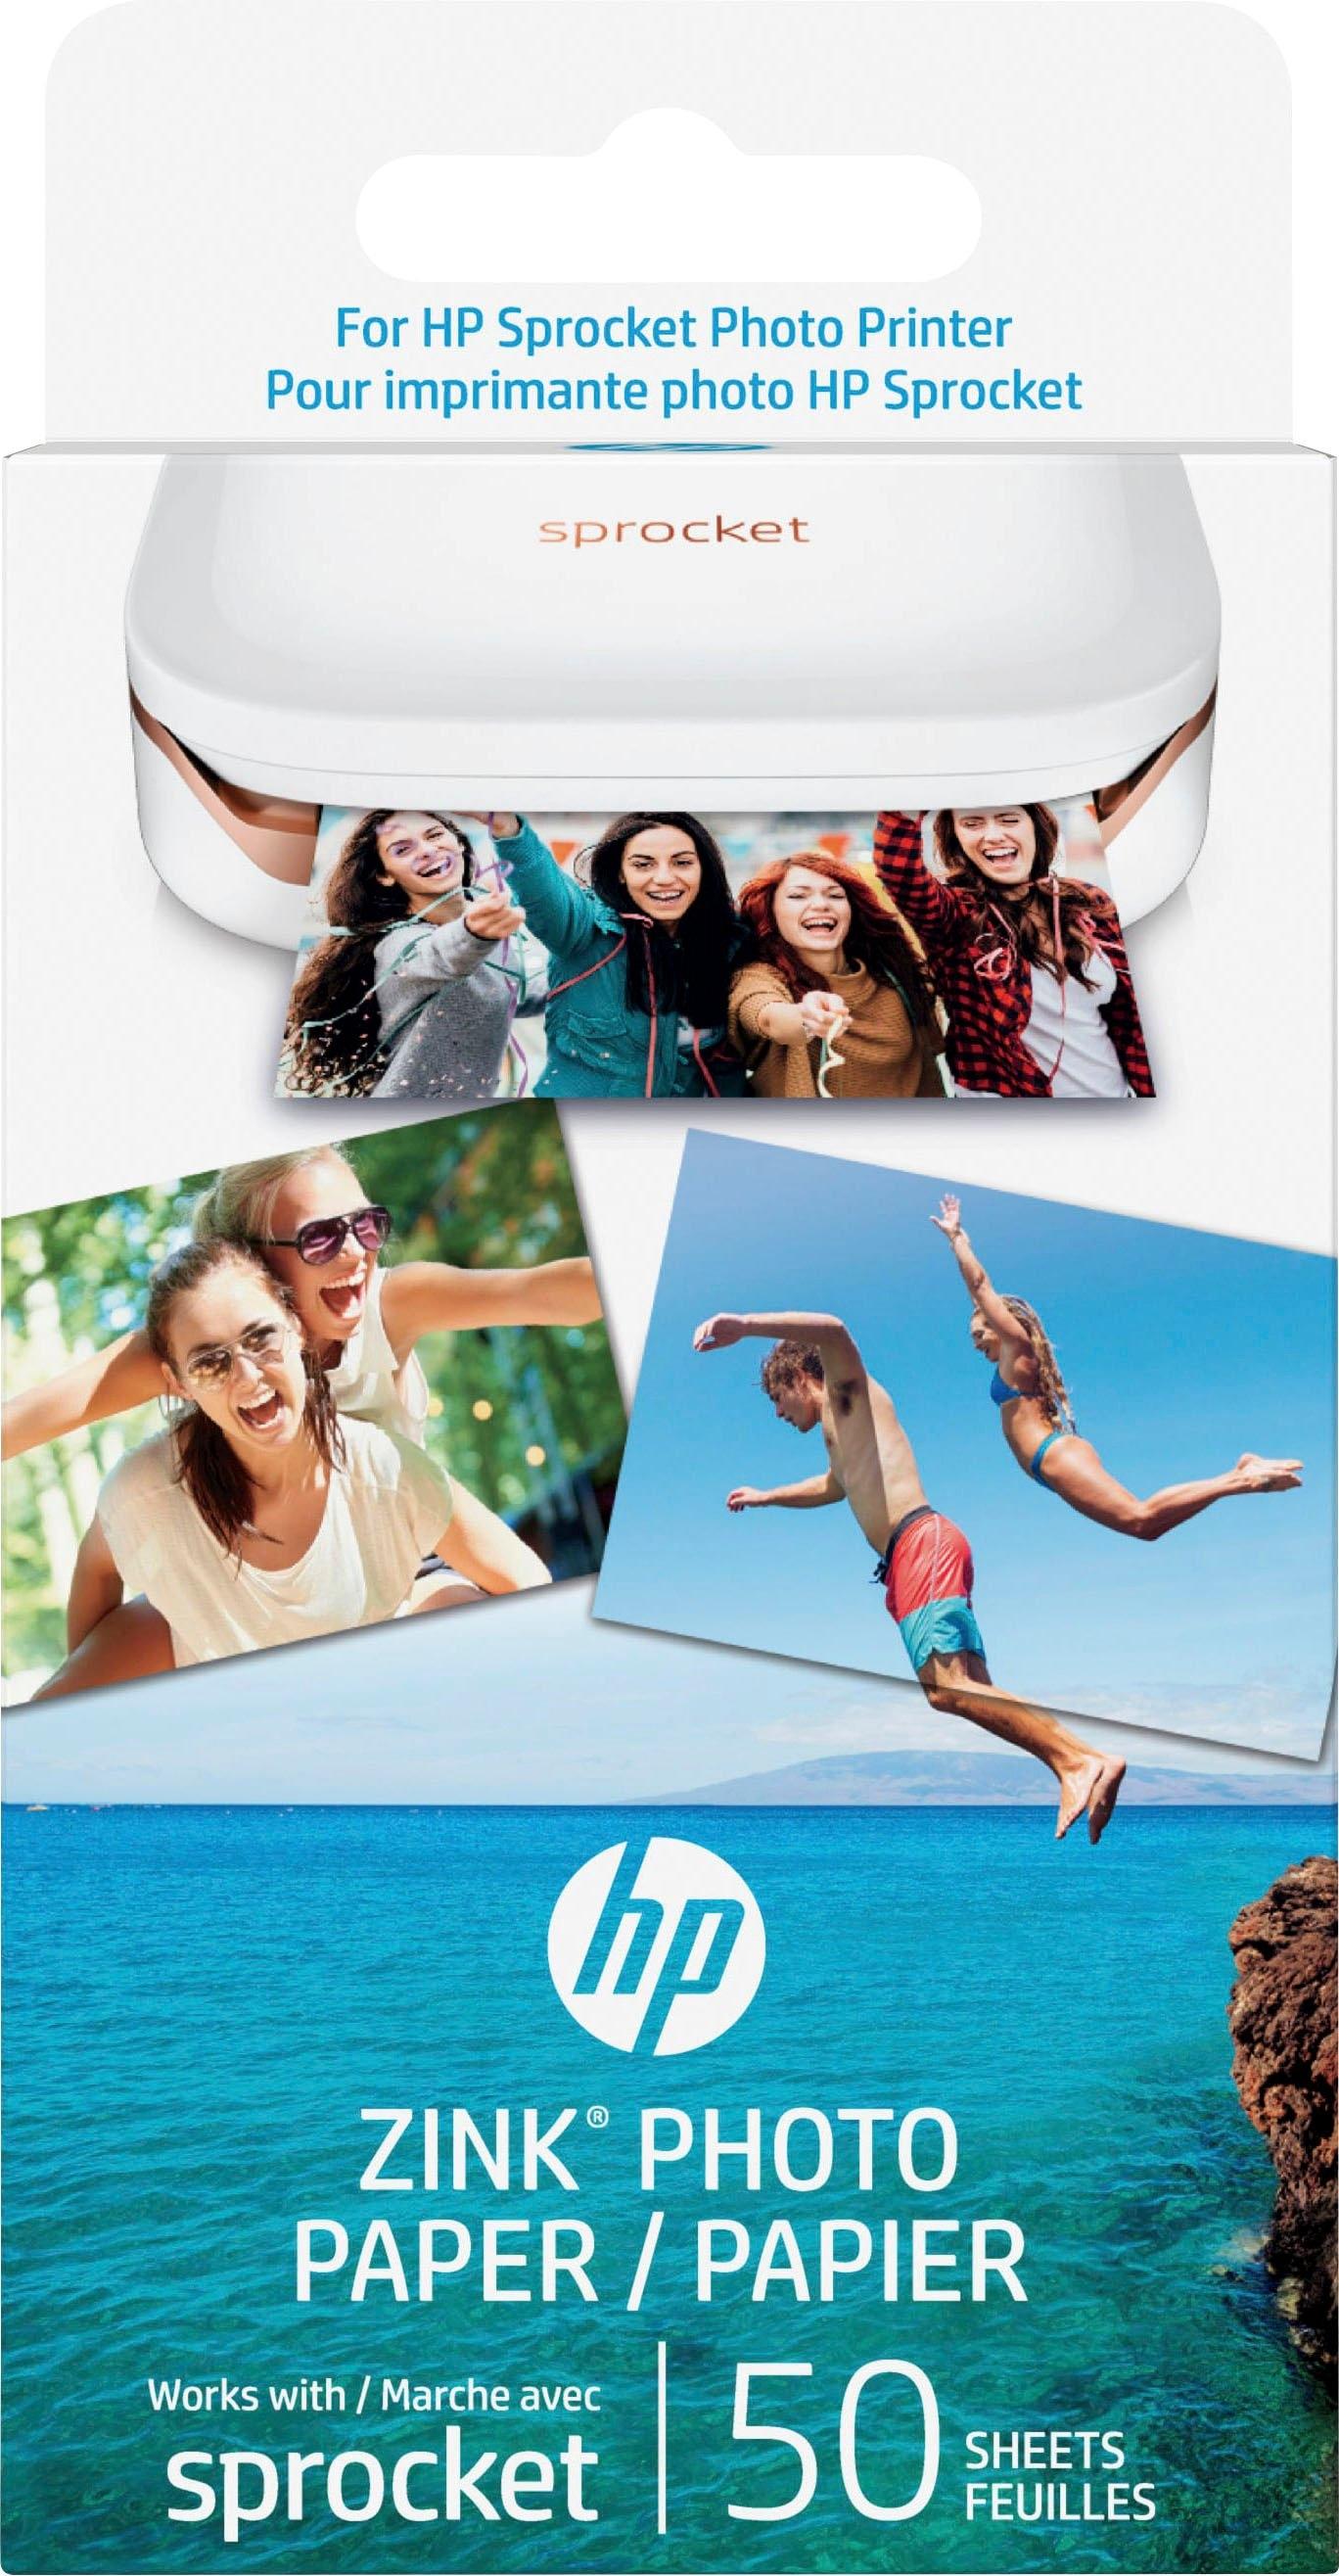 HP »1DE39A HP Sprocket« fotopapier veilig op otto.nl kopen